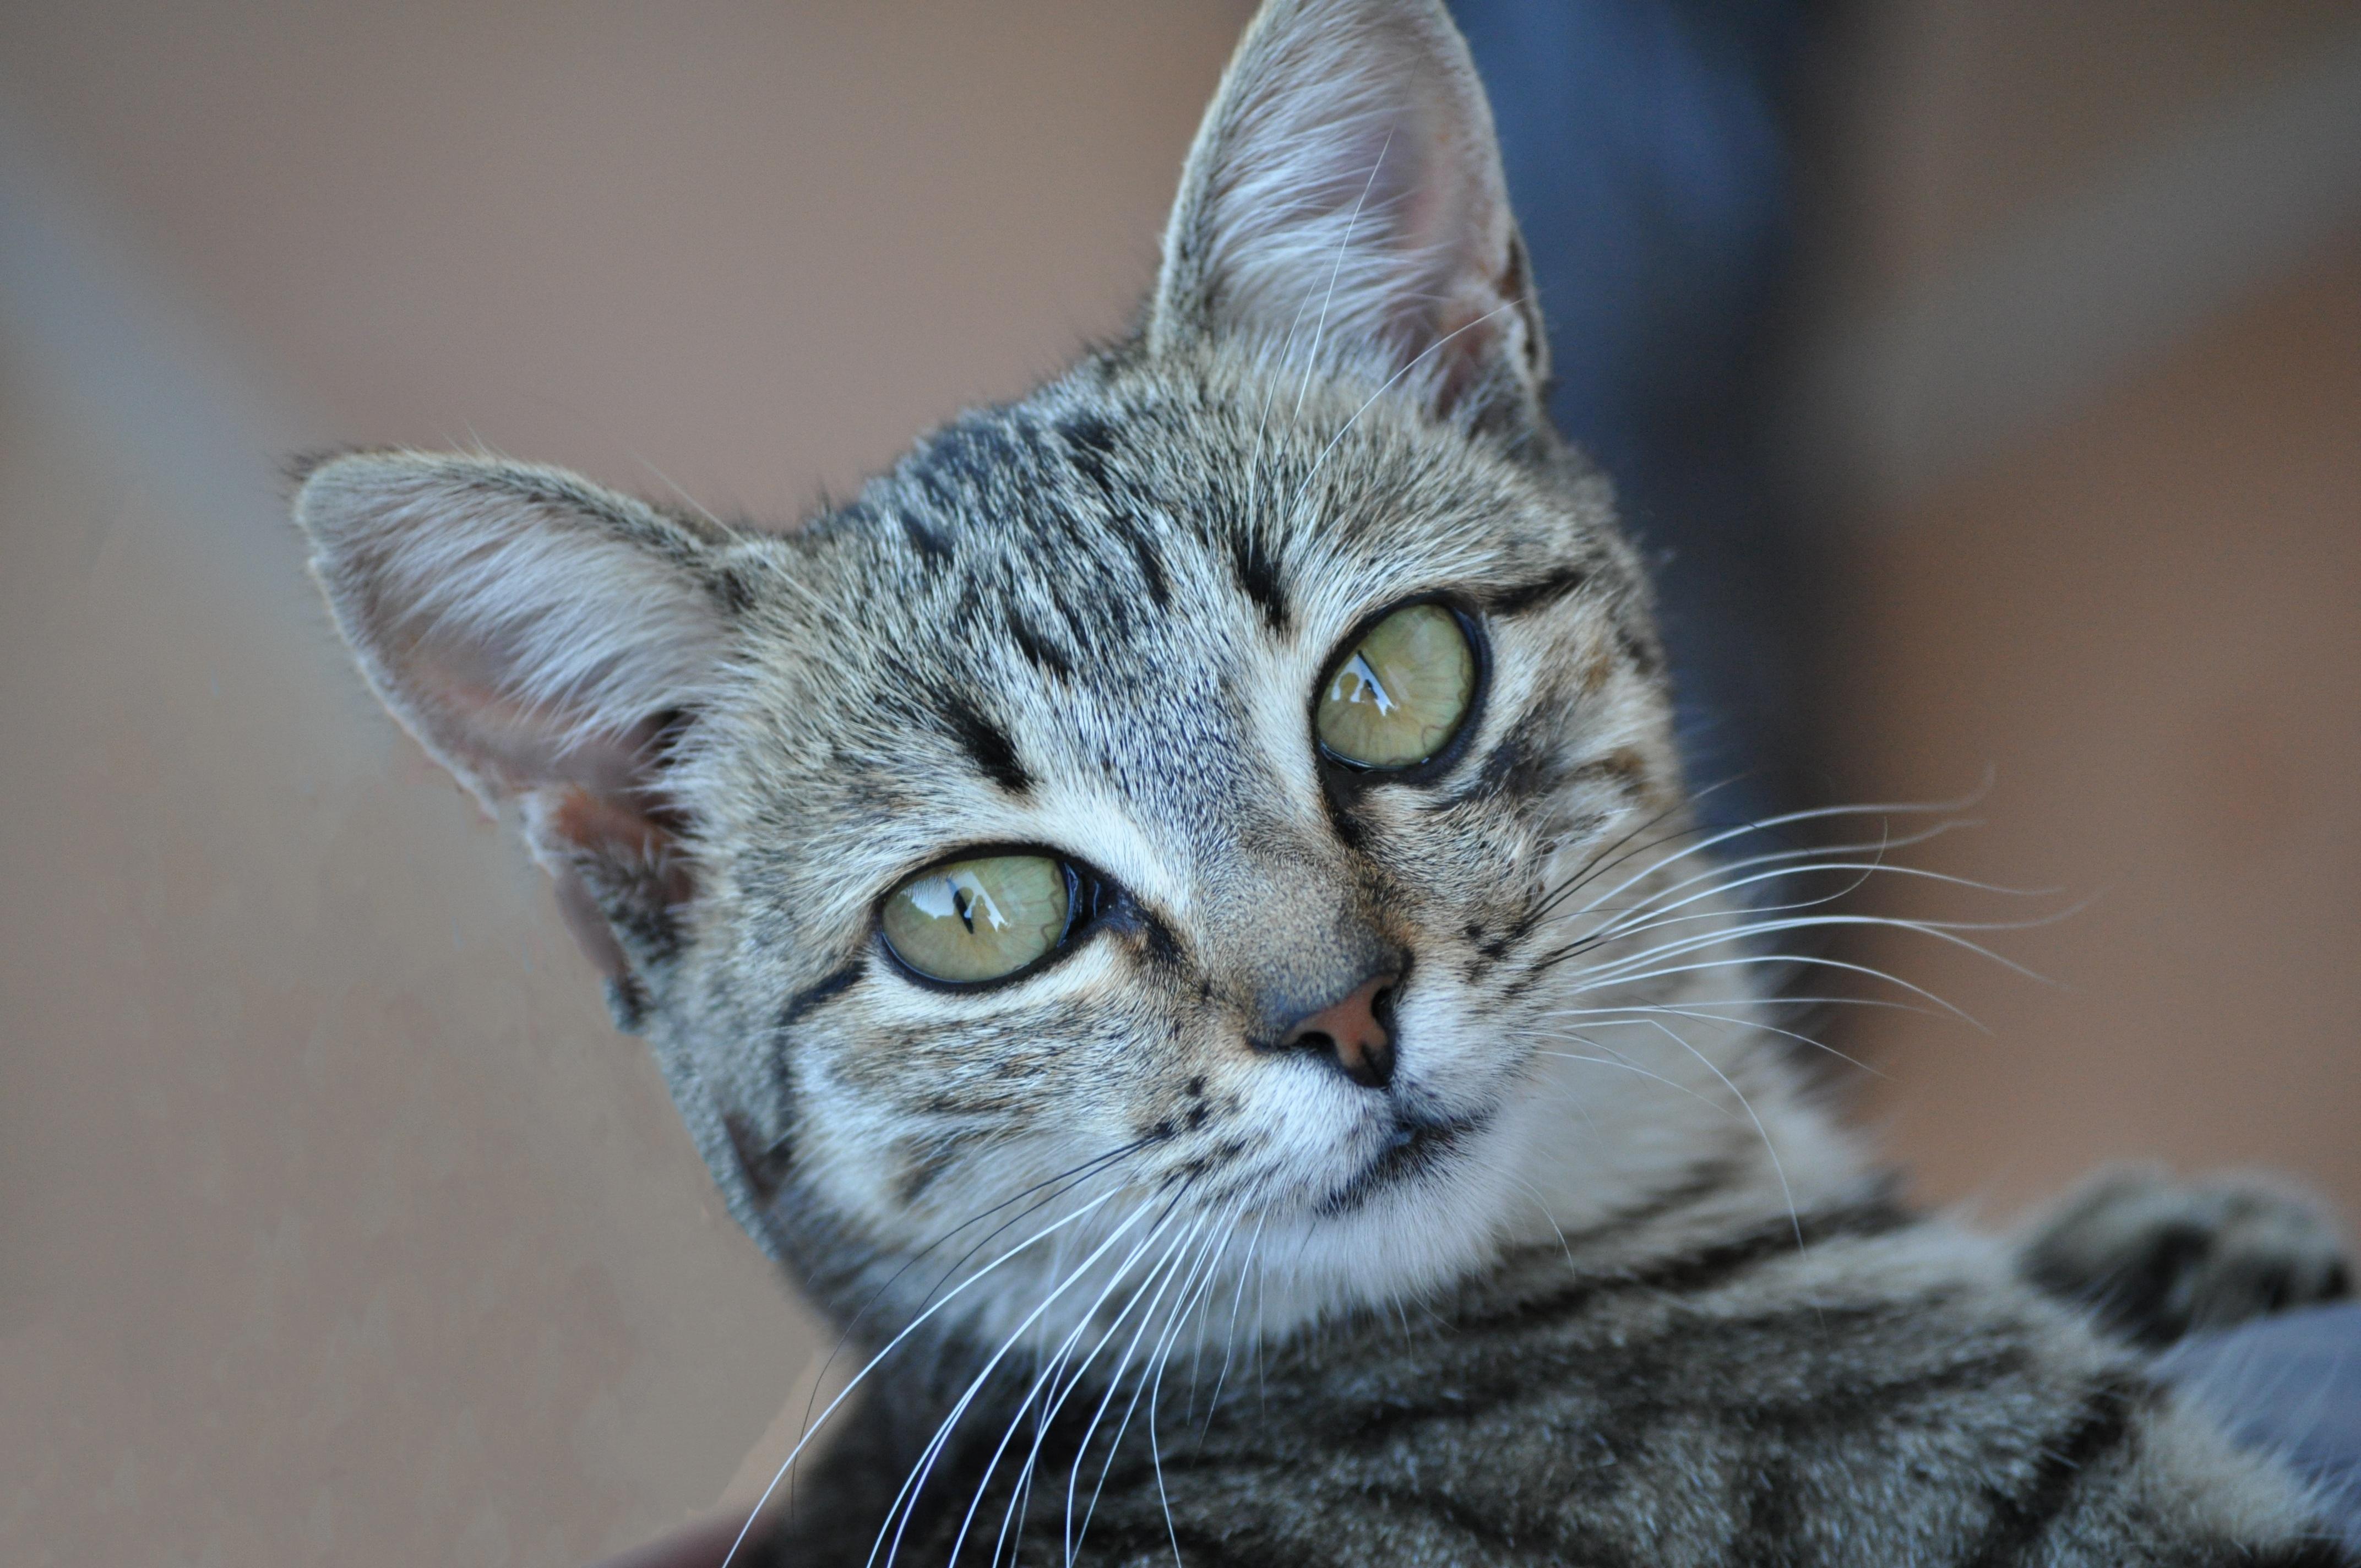 Free kitten fauna close up eyes whiskers grey tiger